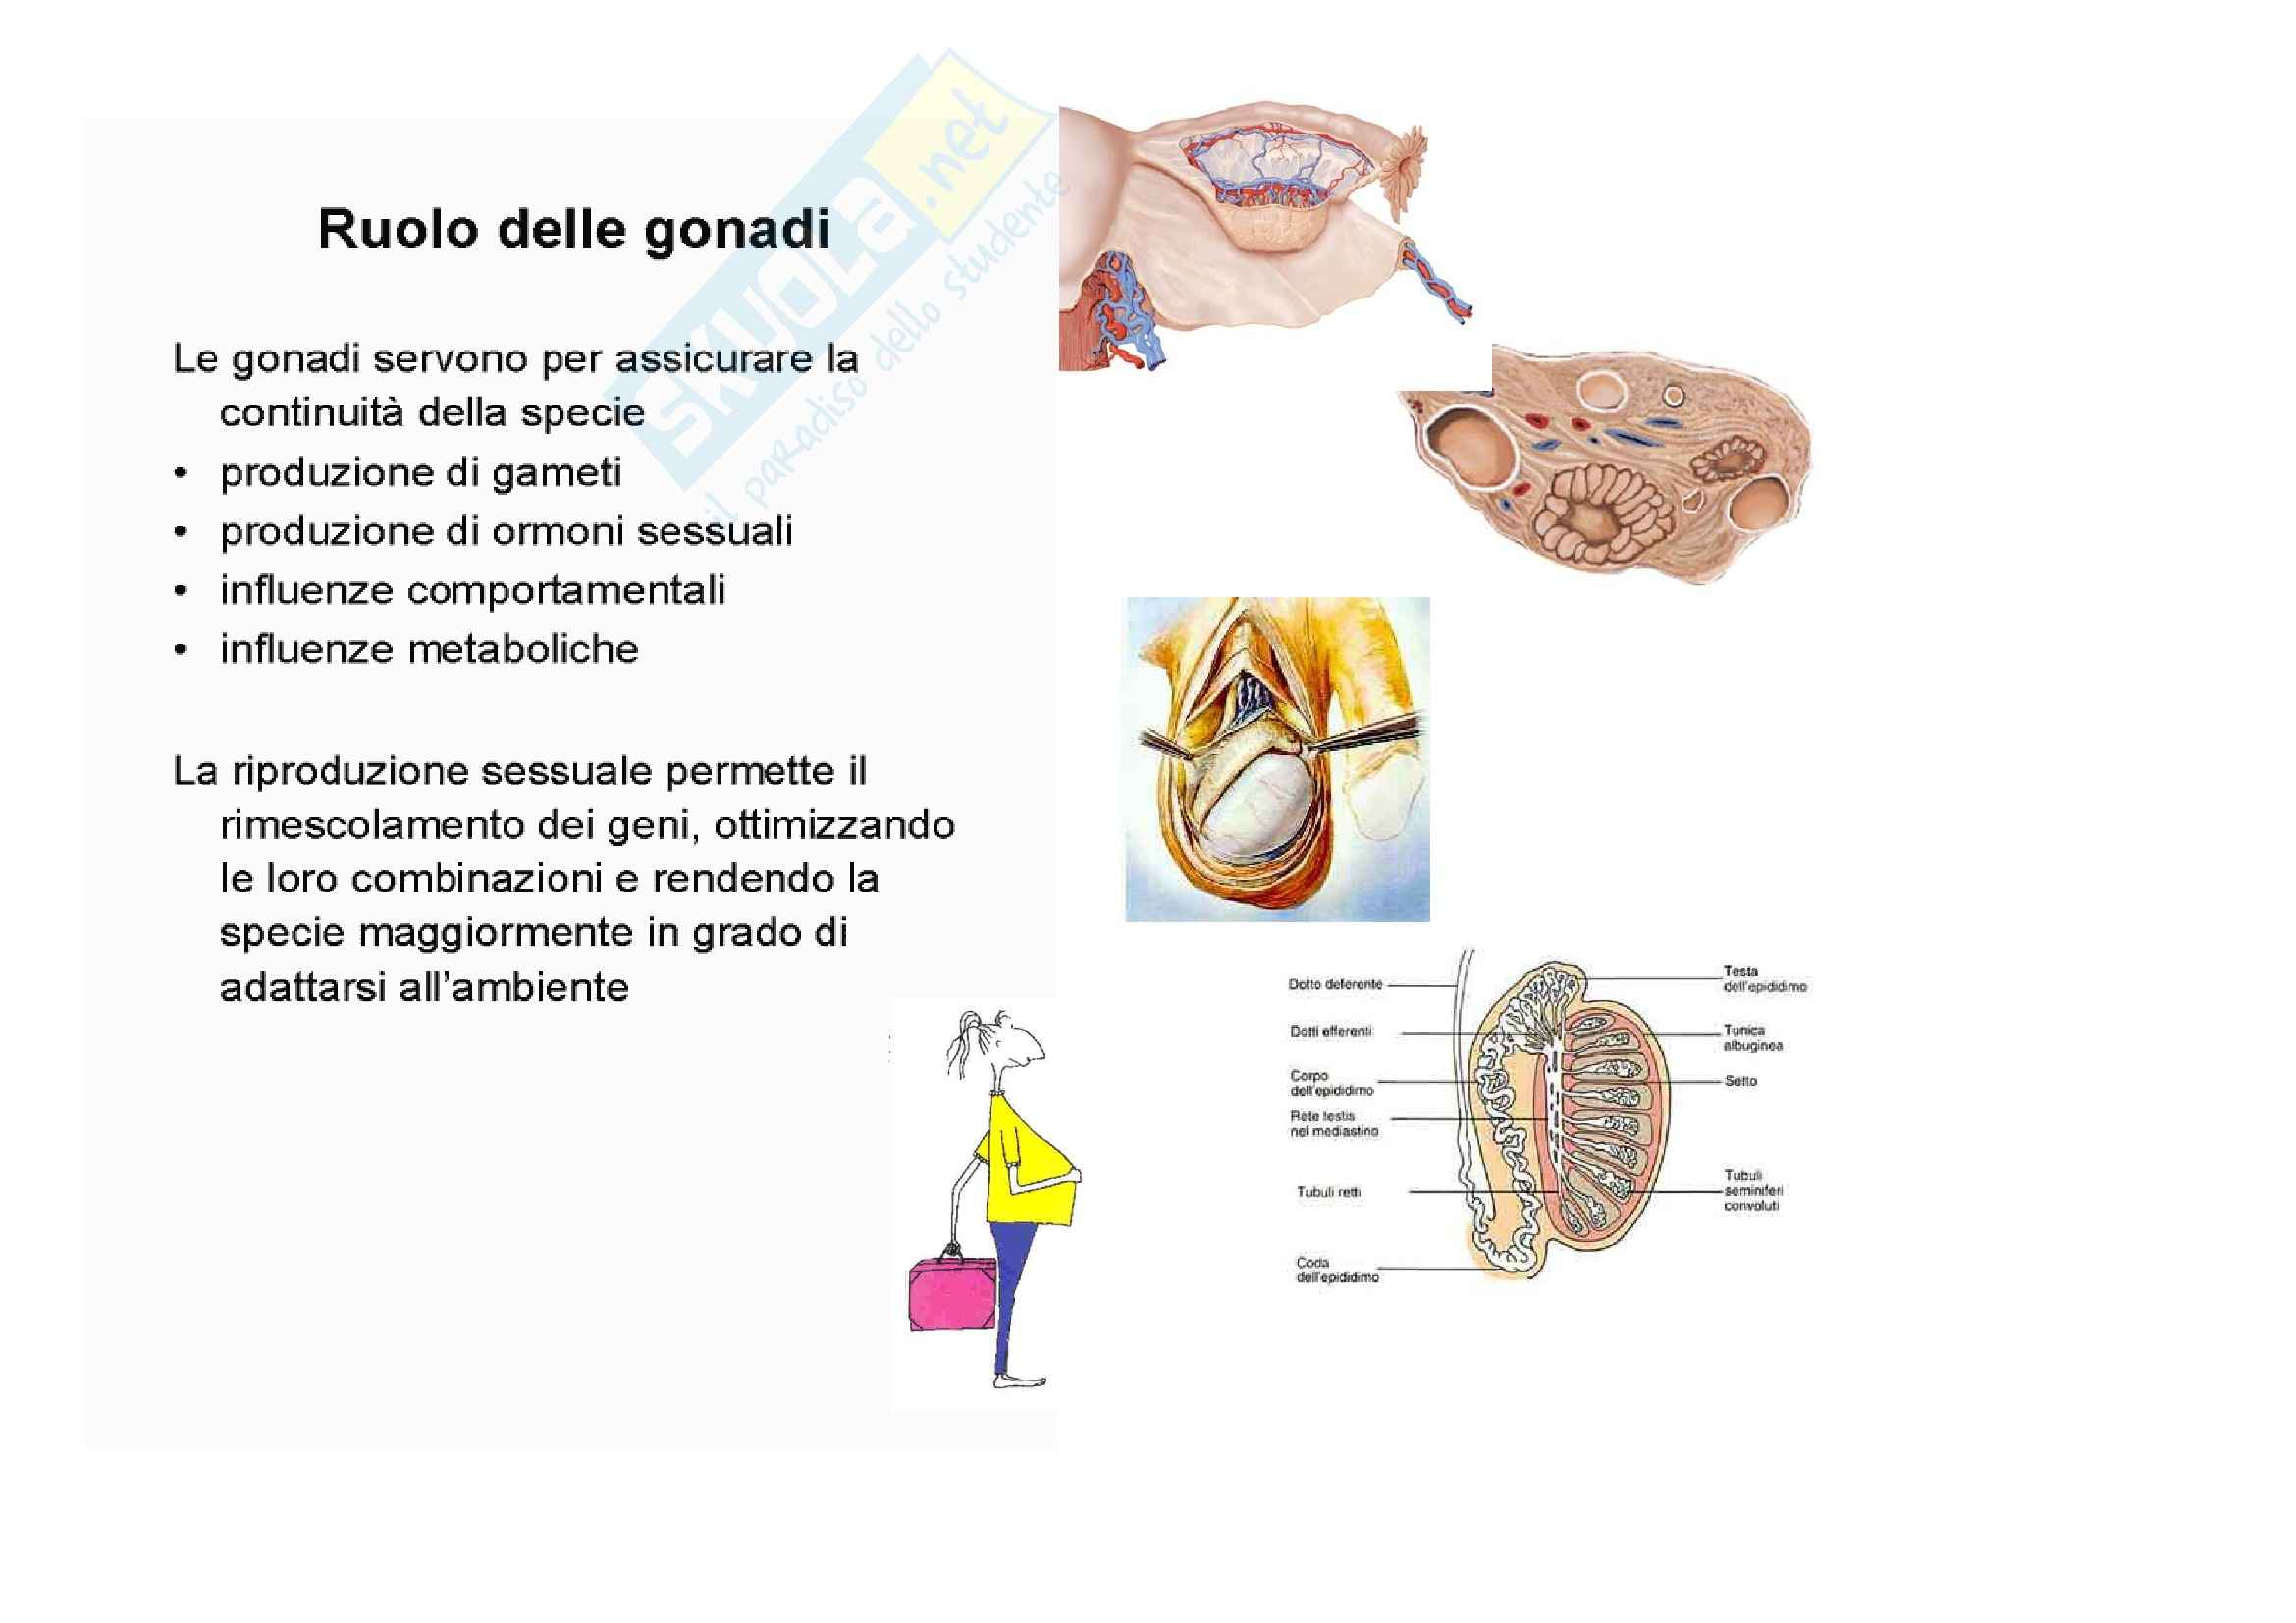 Ginecologia e ostetricia - Gonadi